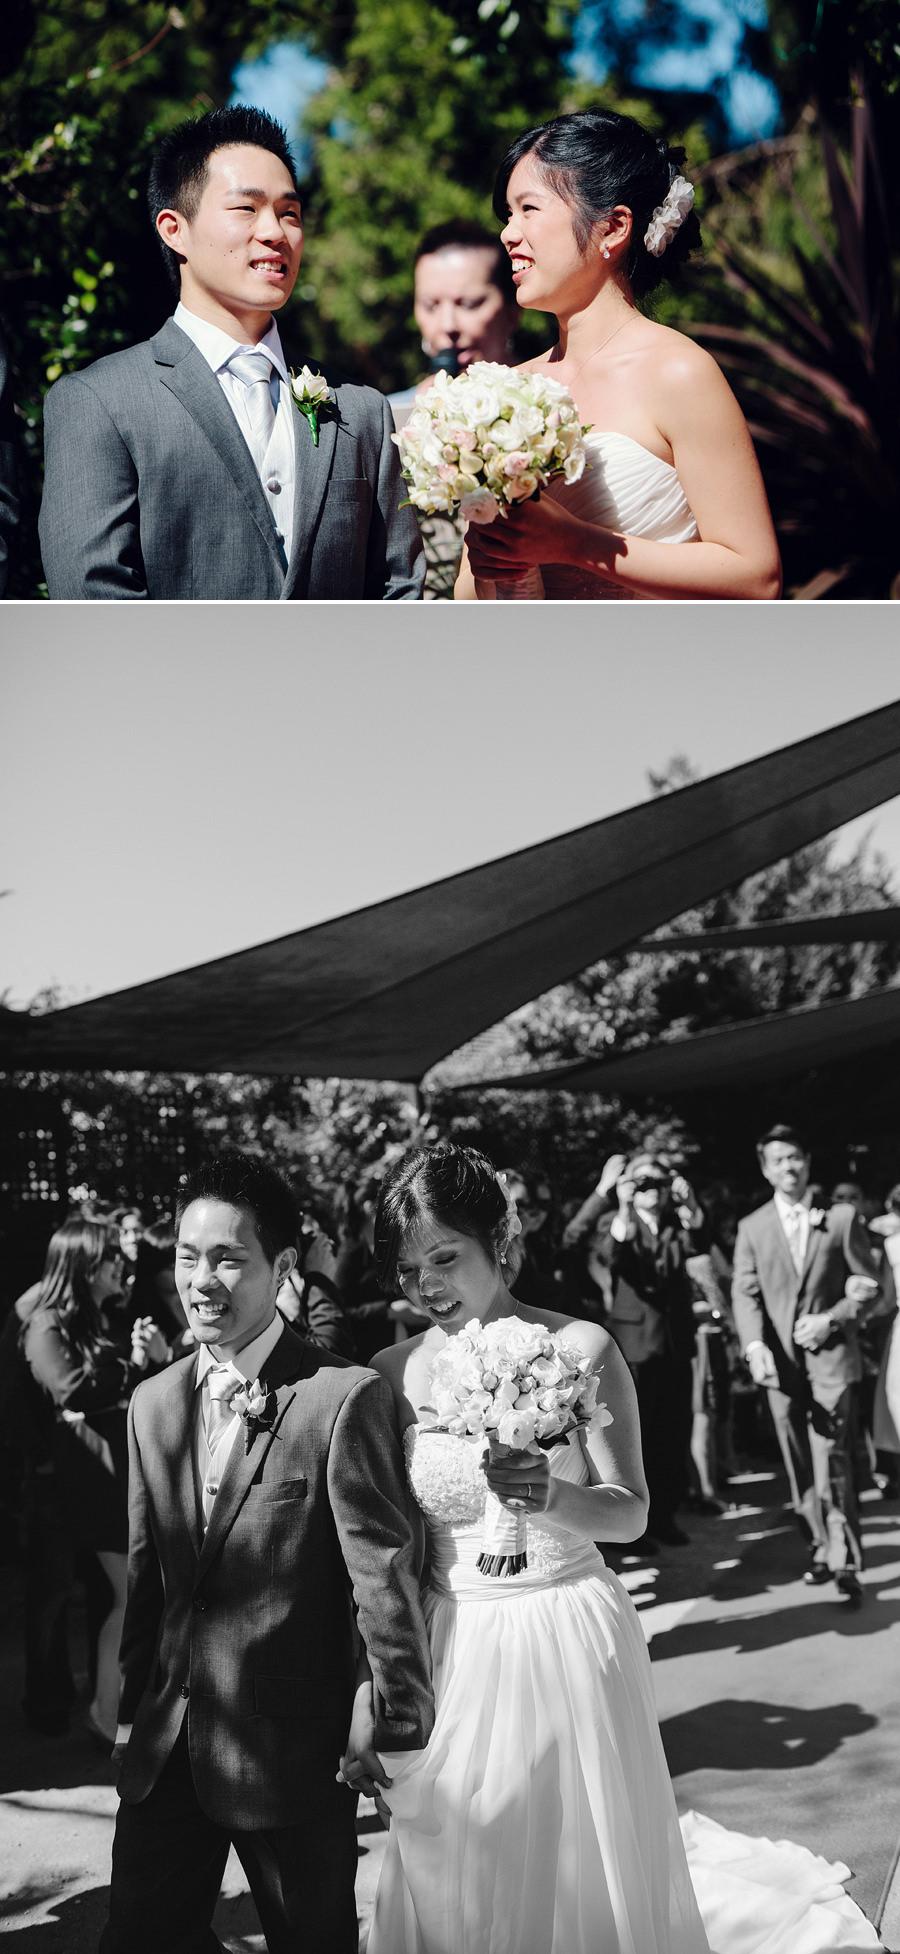 Sutherland Shire Wedding Photographer: Bride & groom leaving ceremony